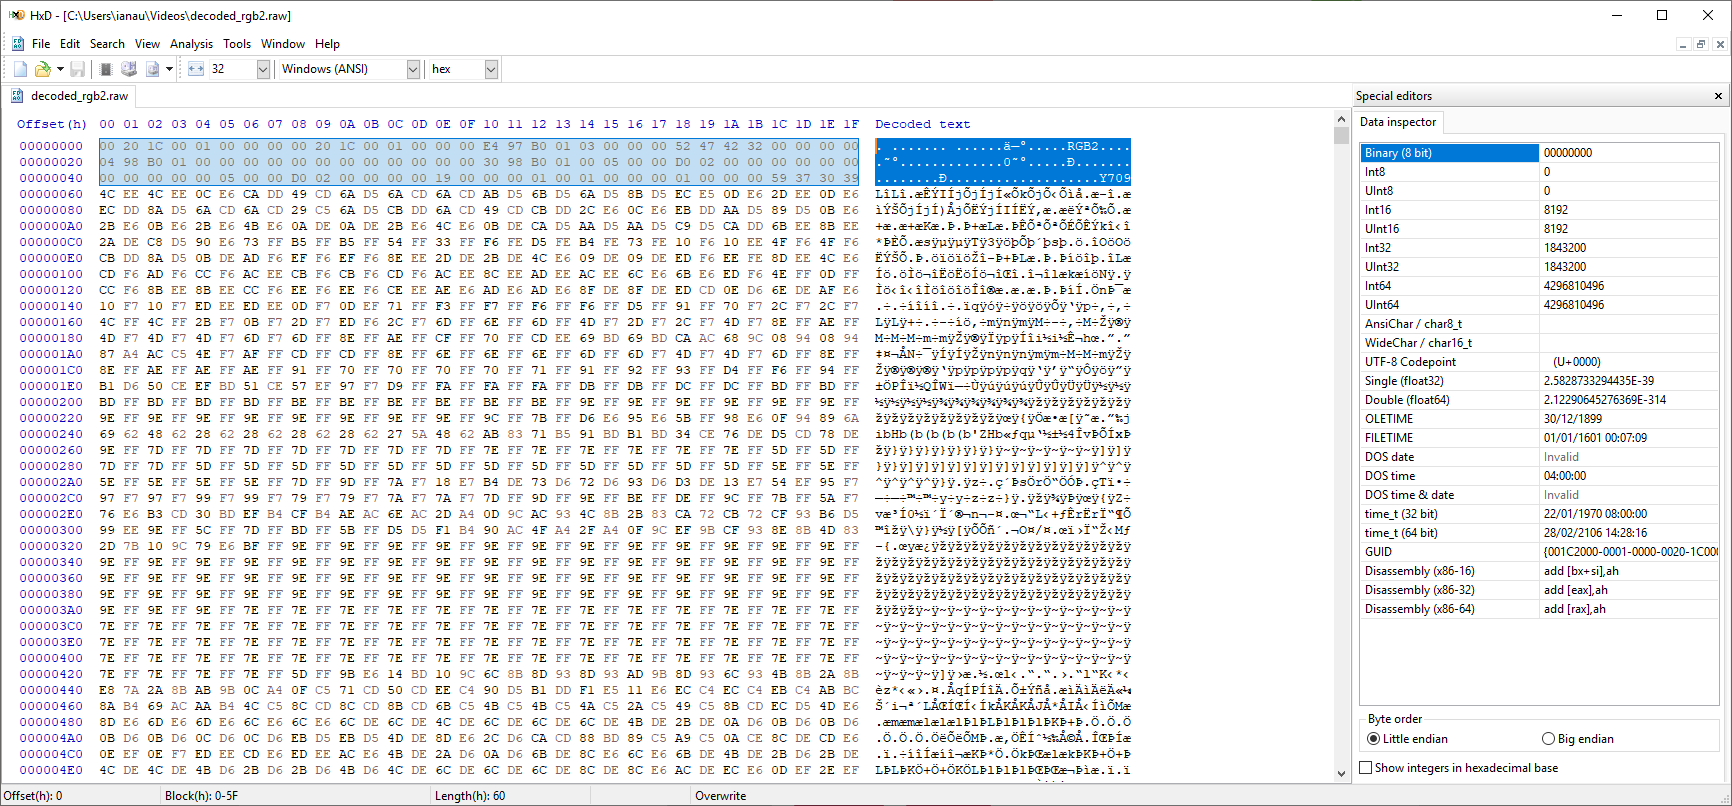 MMALSharp - C# API for Raspberry Pi Camera - Page 2